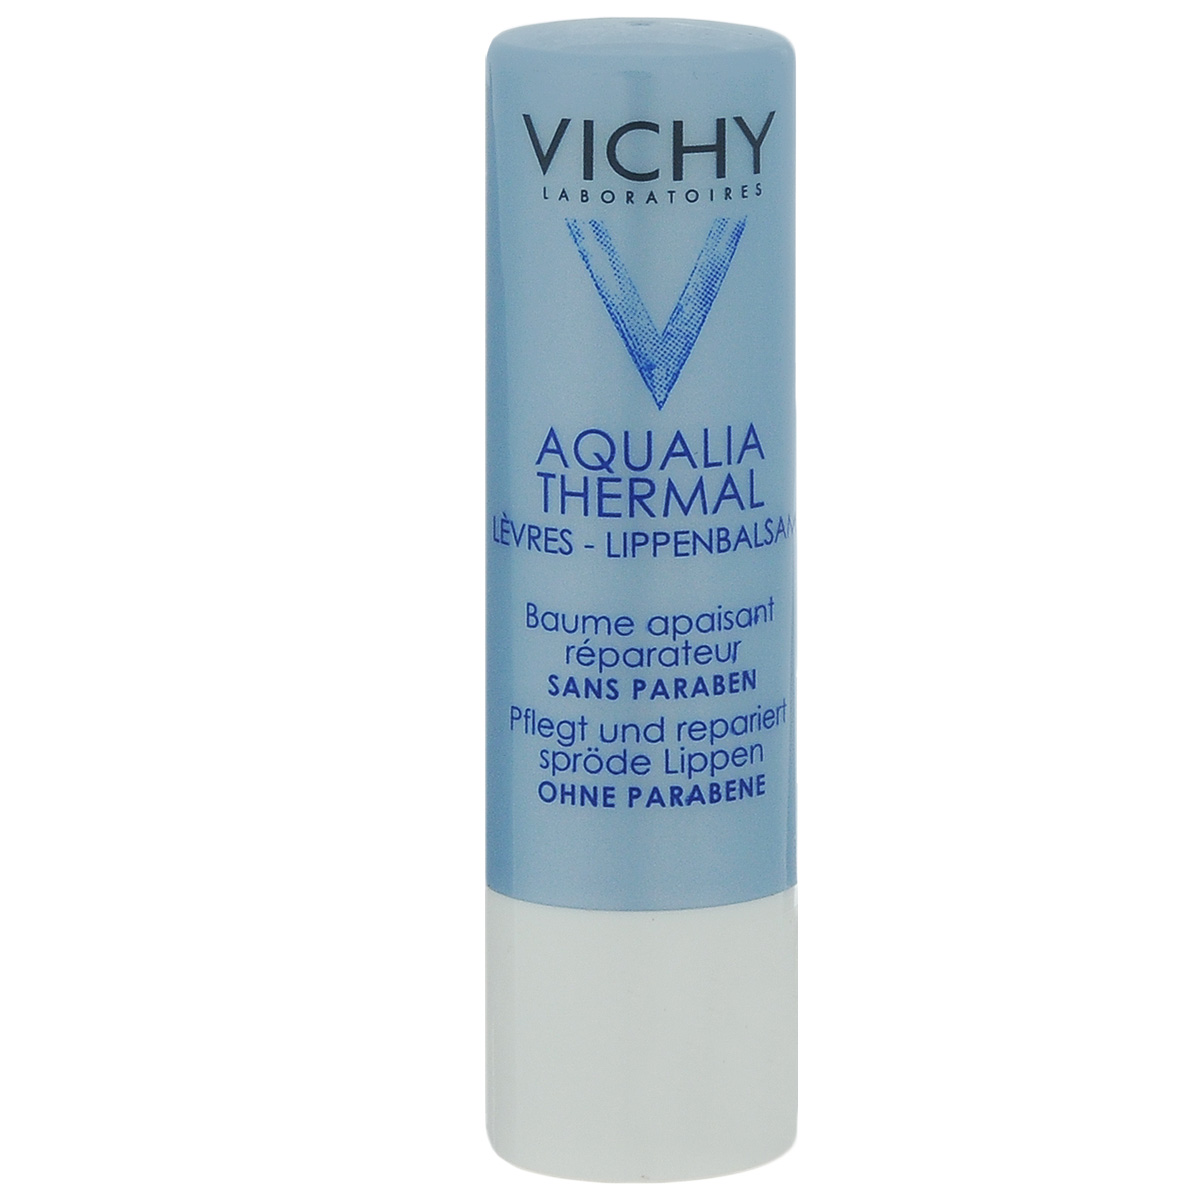 Vichy Aqualia Thermal Увлажняющий и восстанавливающий бальзам для губ Aqualia Thermal, 5 мл vichy aqualia thermal насыщенный крем банка 50 мл